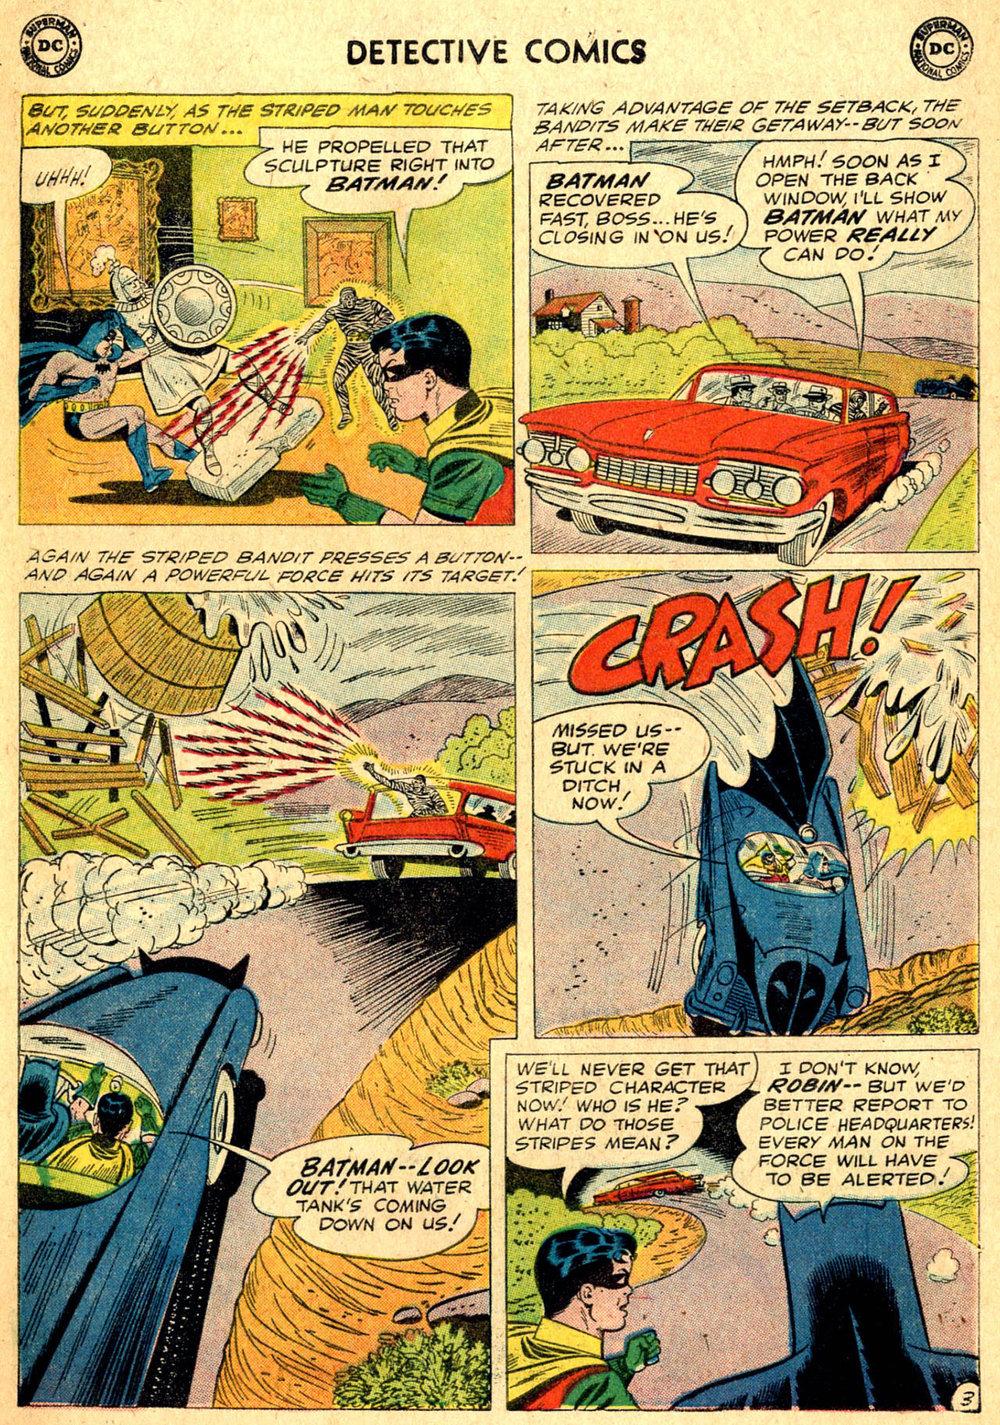 Detective Comics (1937) 275 5.jpg